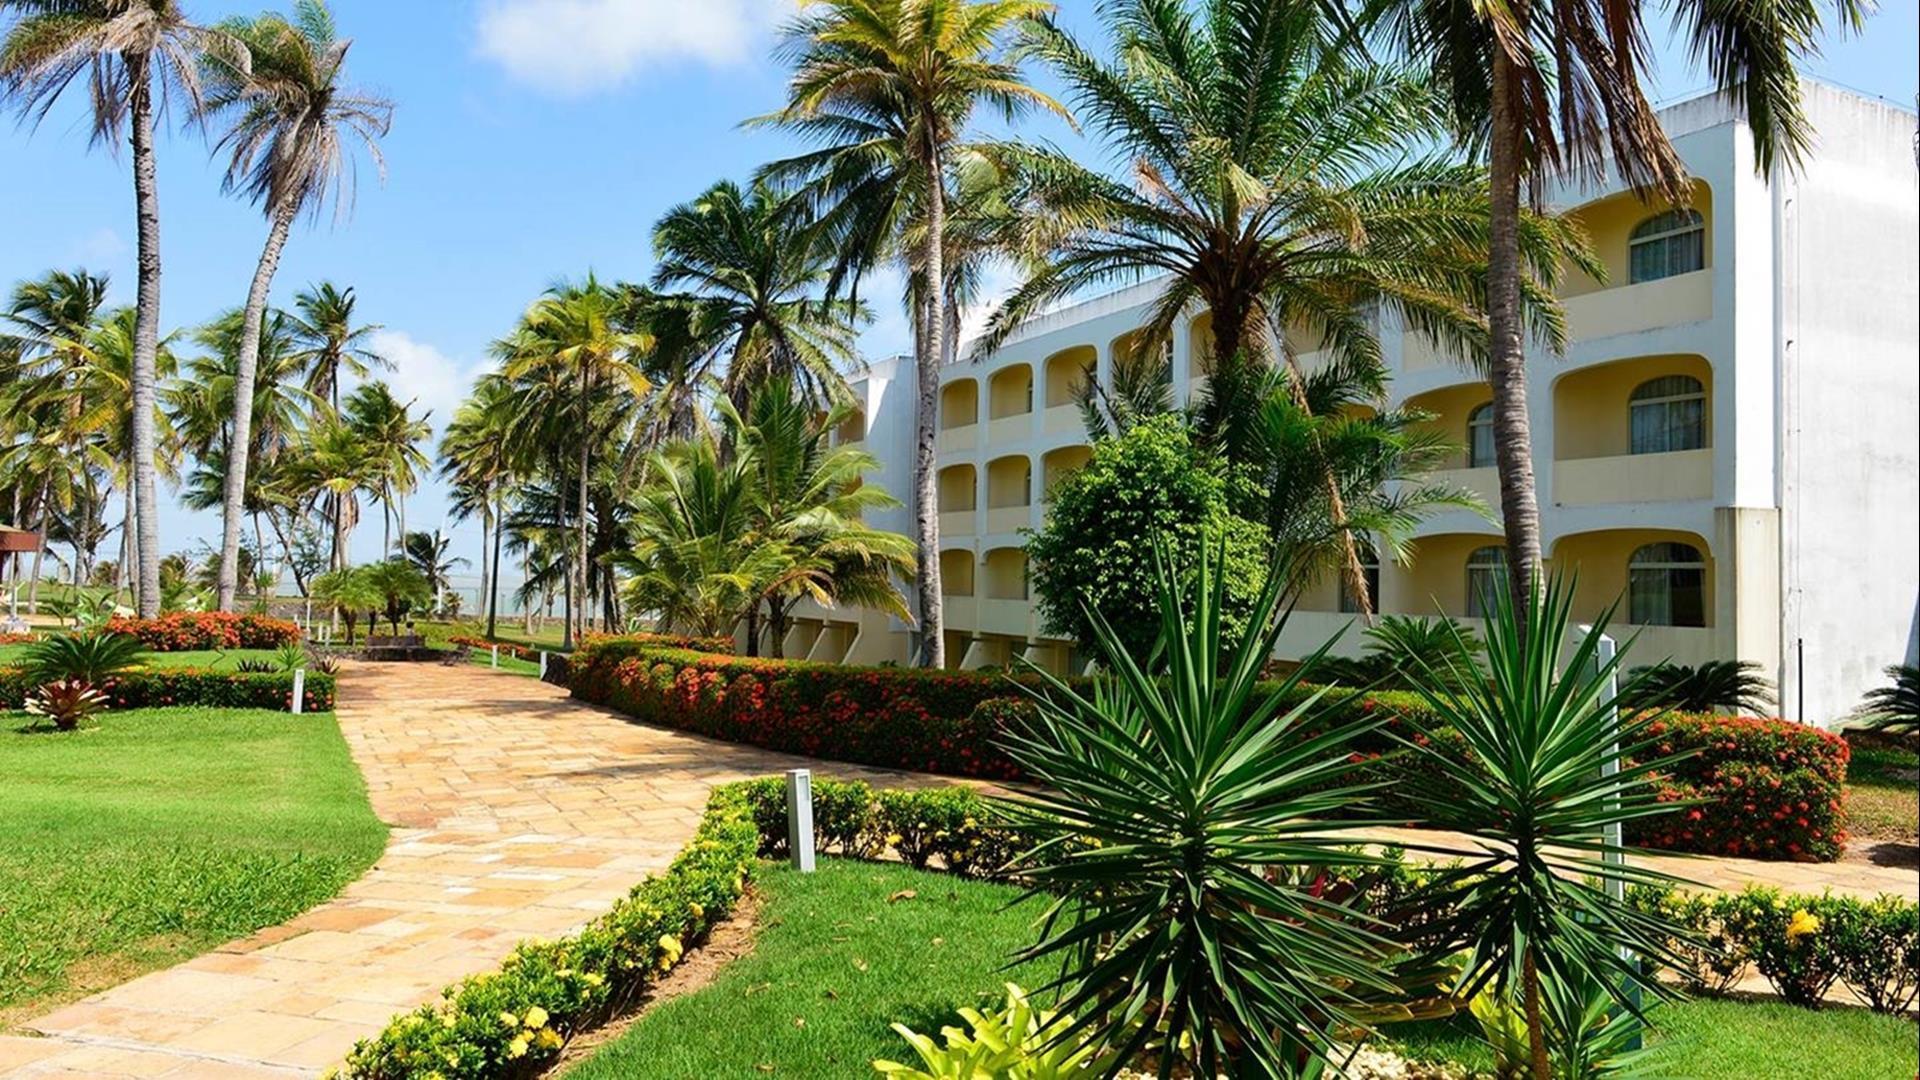 Brasilien Sao Luis: Superior Hotel - Hotel Pestana